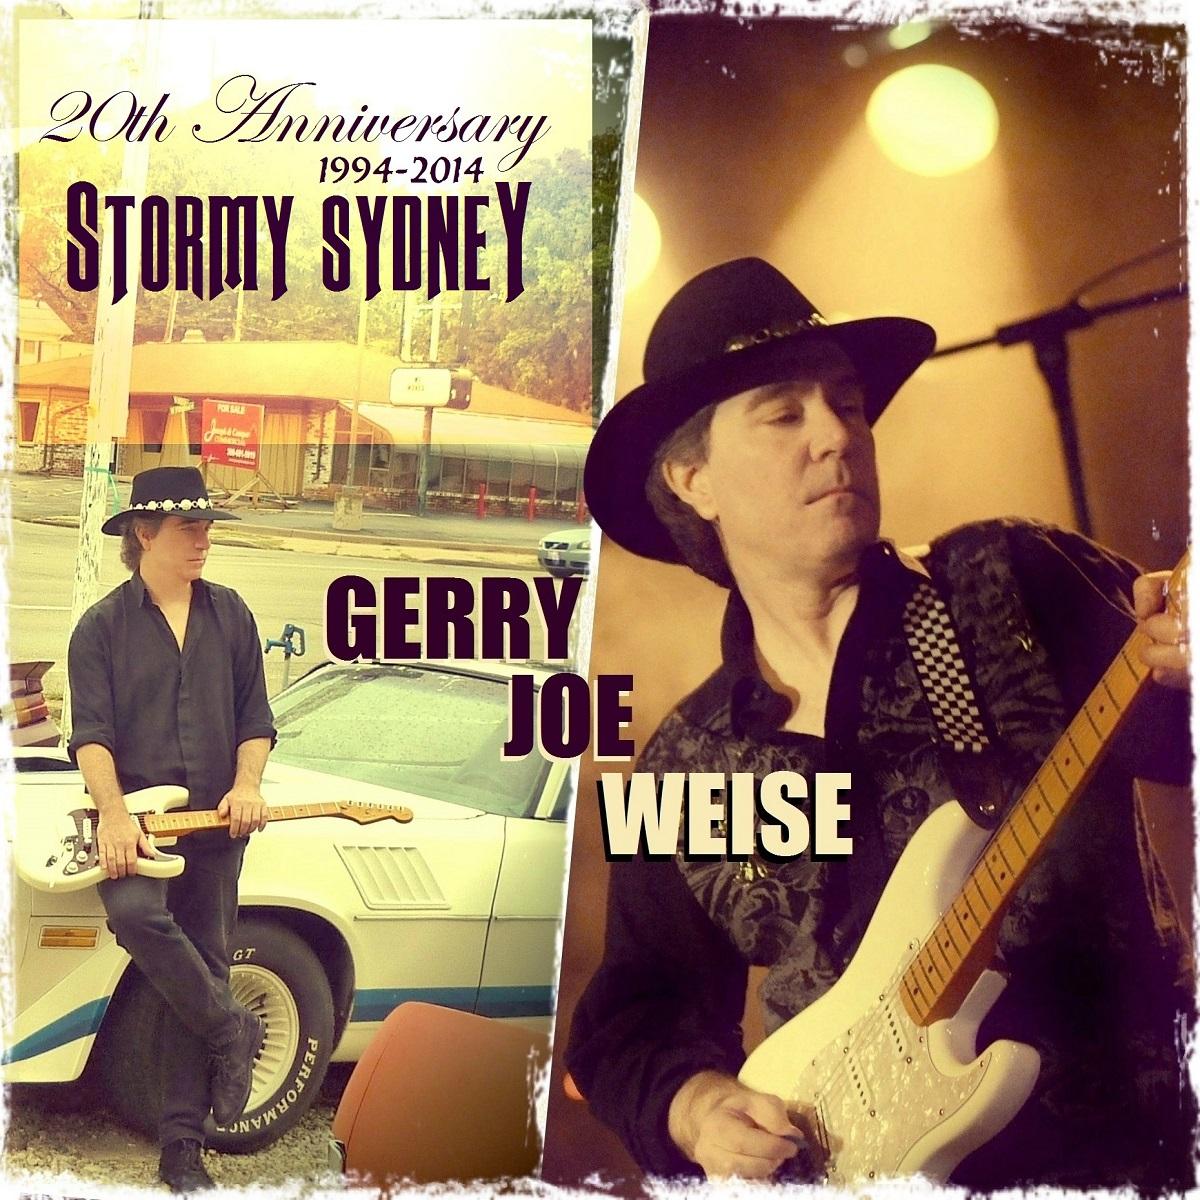 Stormy Sydney 20th Anniversary, 2014 album